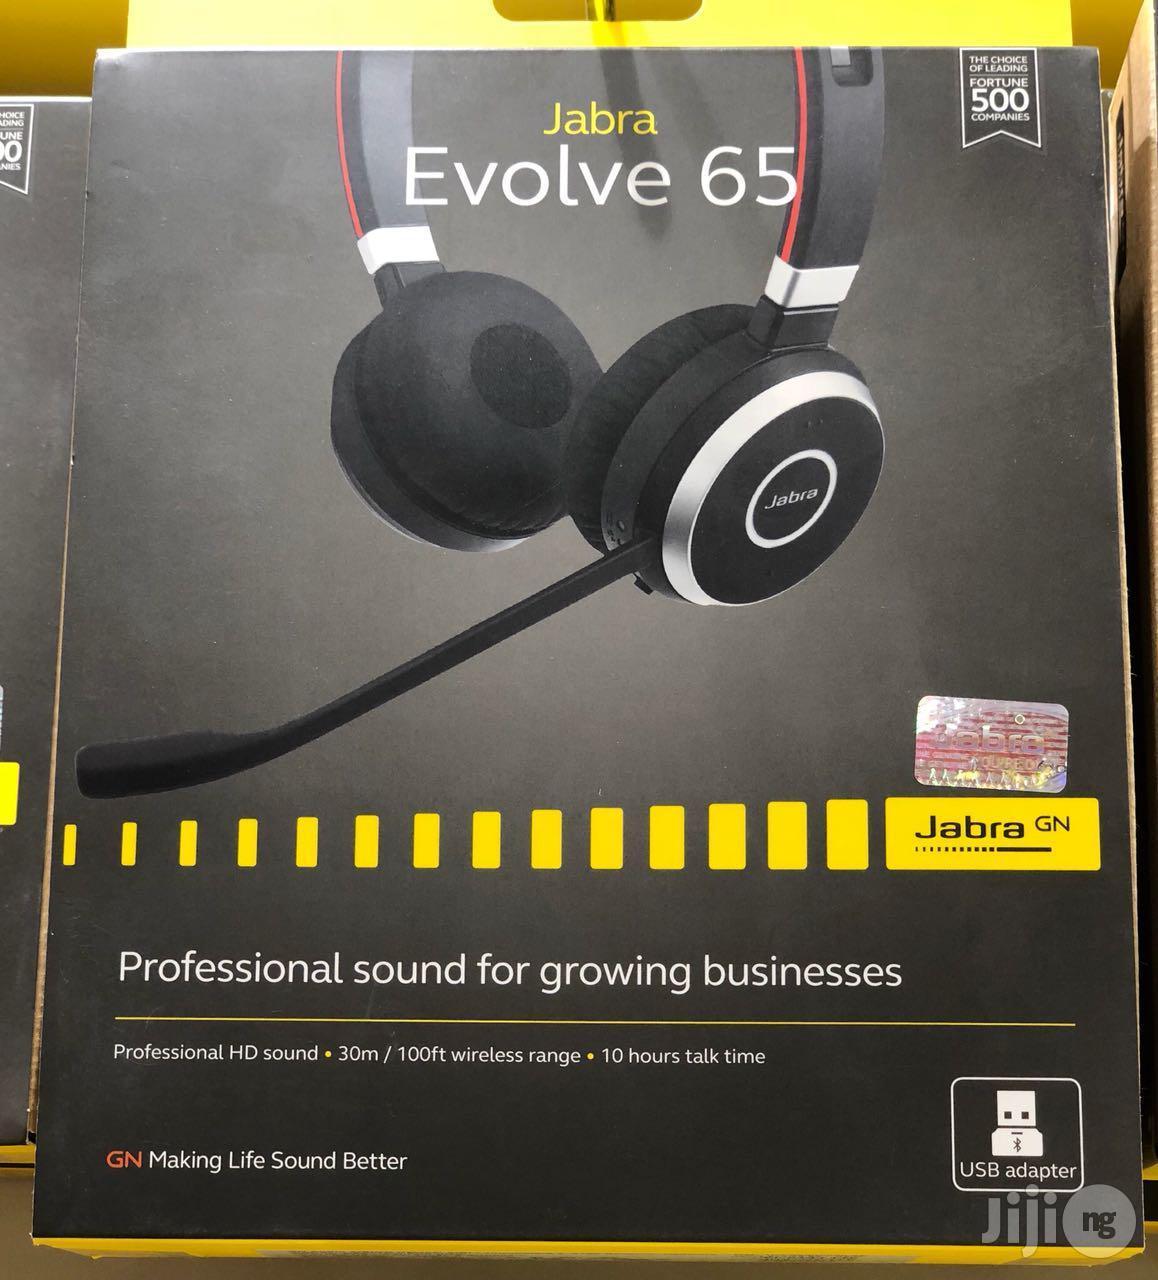 Jabra Evolve 65 Ms Stereo Bluetooth Headset In Port Harcourt Headphones Buzztrends Obinna Jiji Ng For Sale In Port Harcourt Buy Headphones From Buzztrends Obinna On Jiji Ng